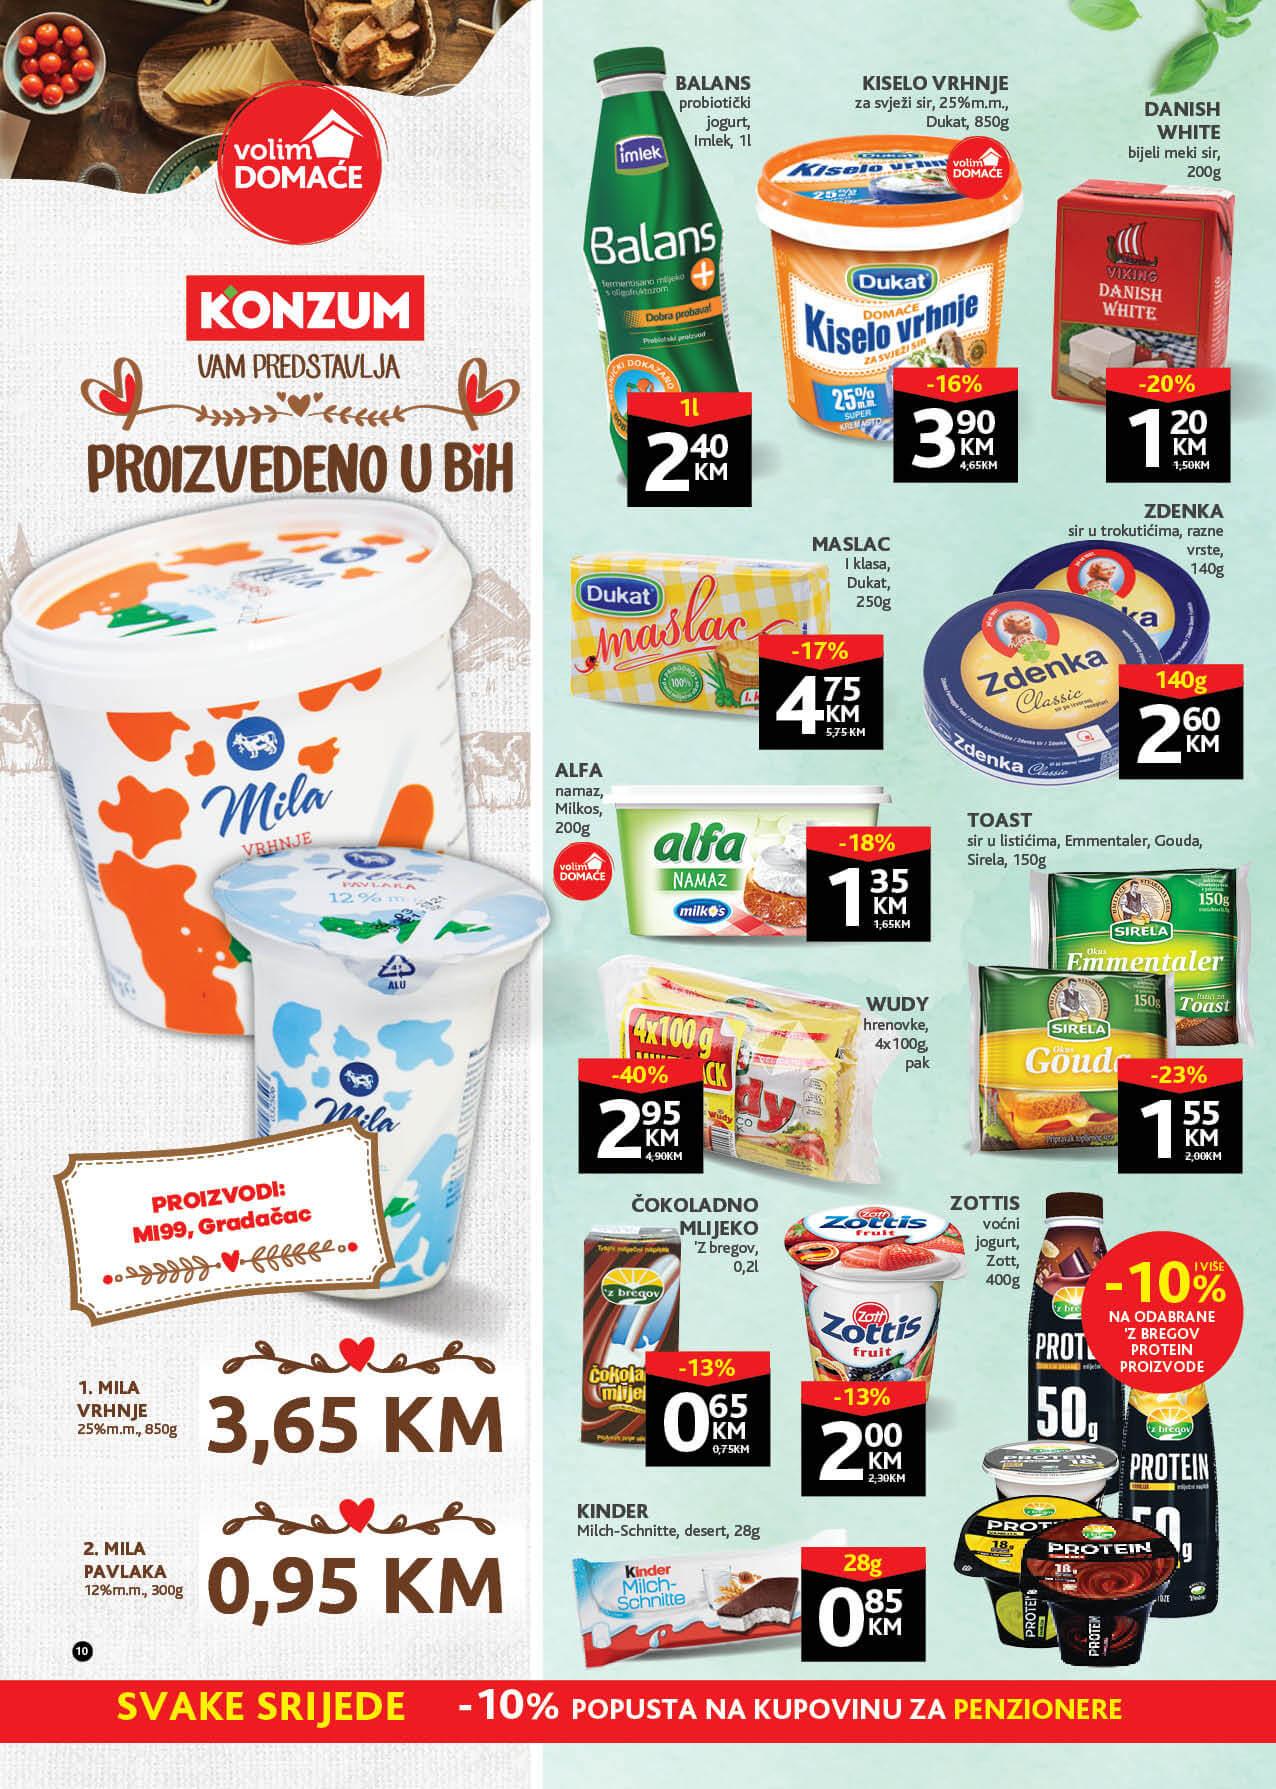 KONZUM Katalog Redovni katalog JUN 2021 07.06. 17.06. eKatalozi.com PR Page 10